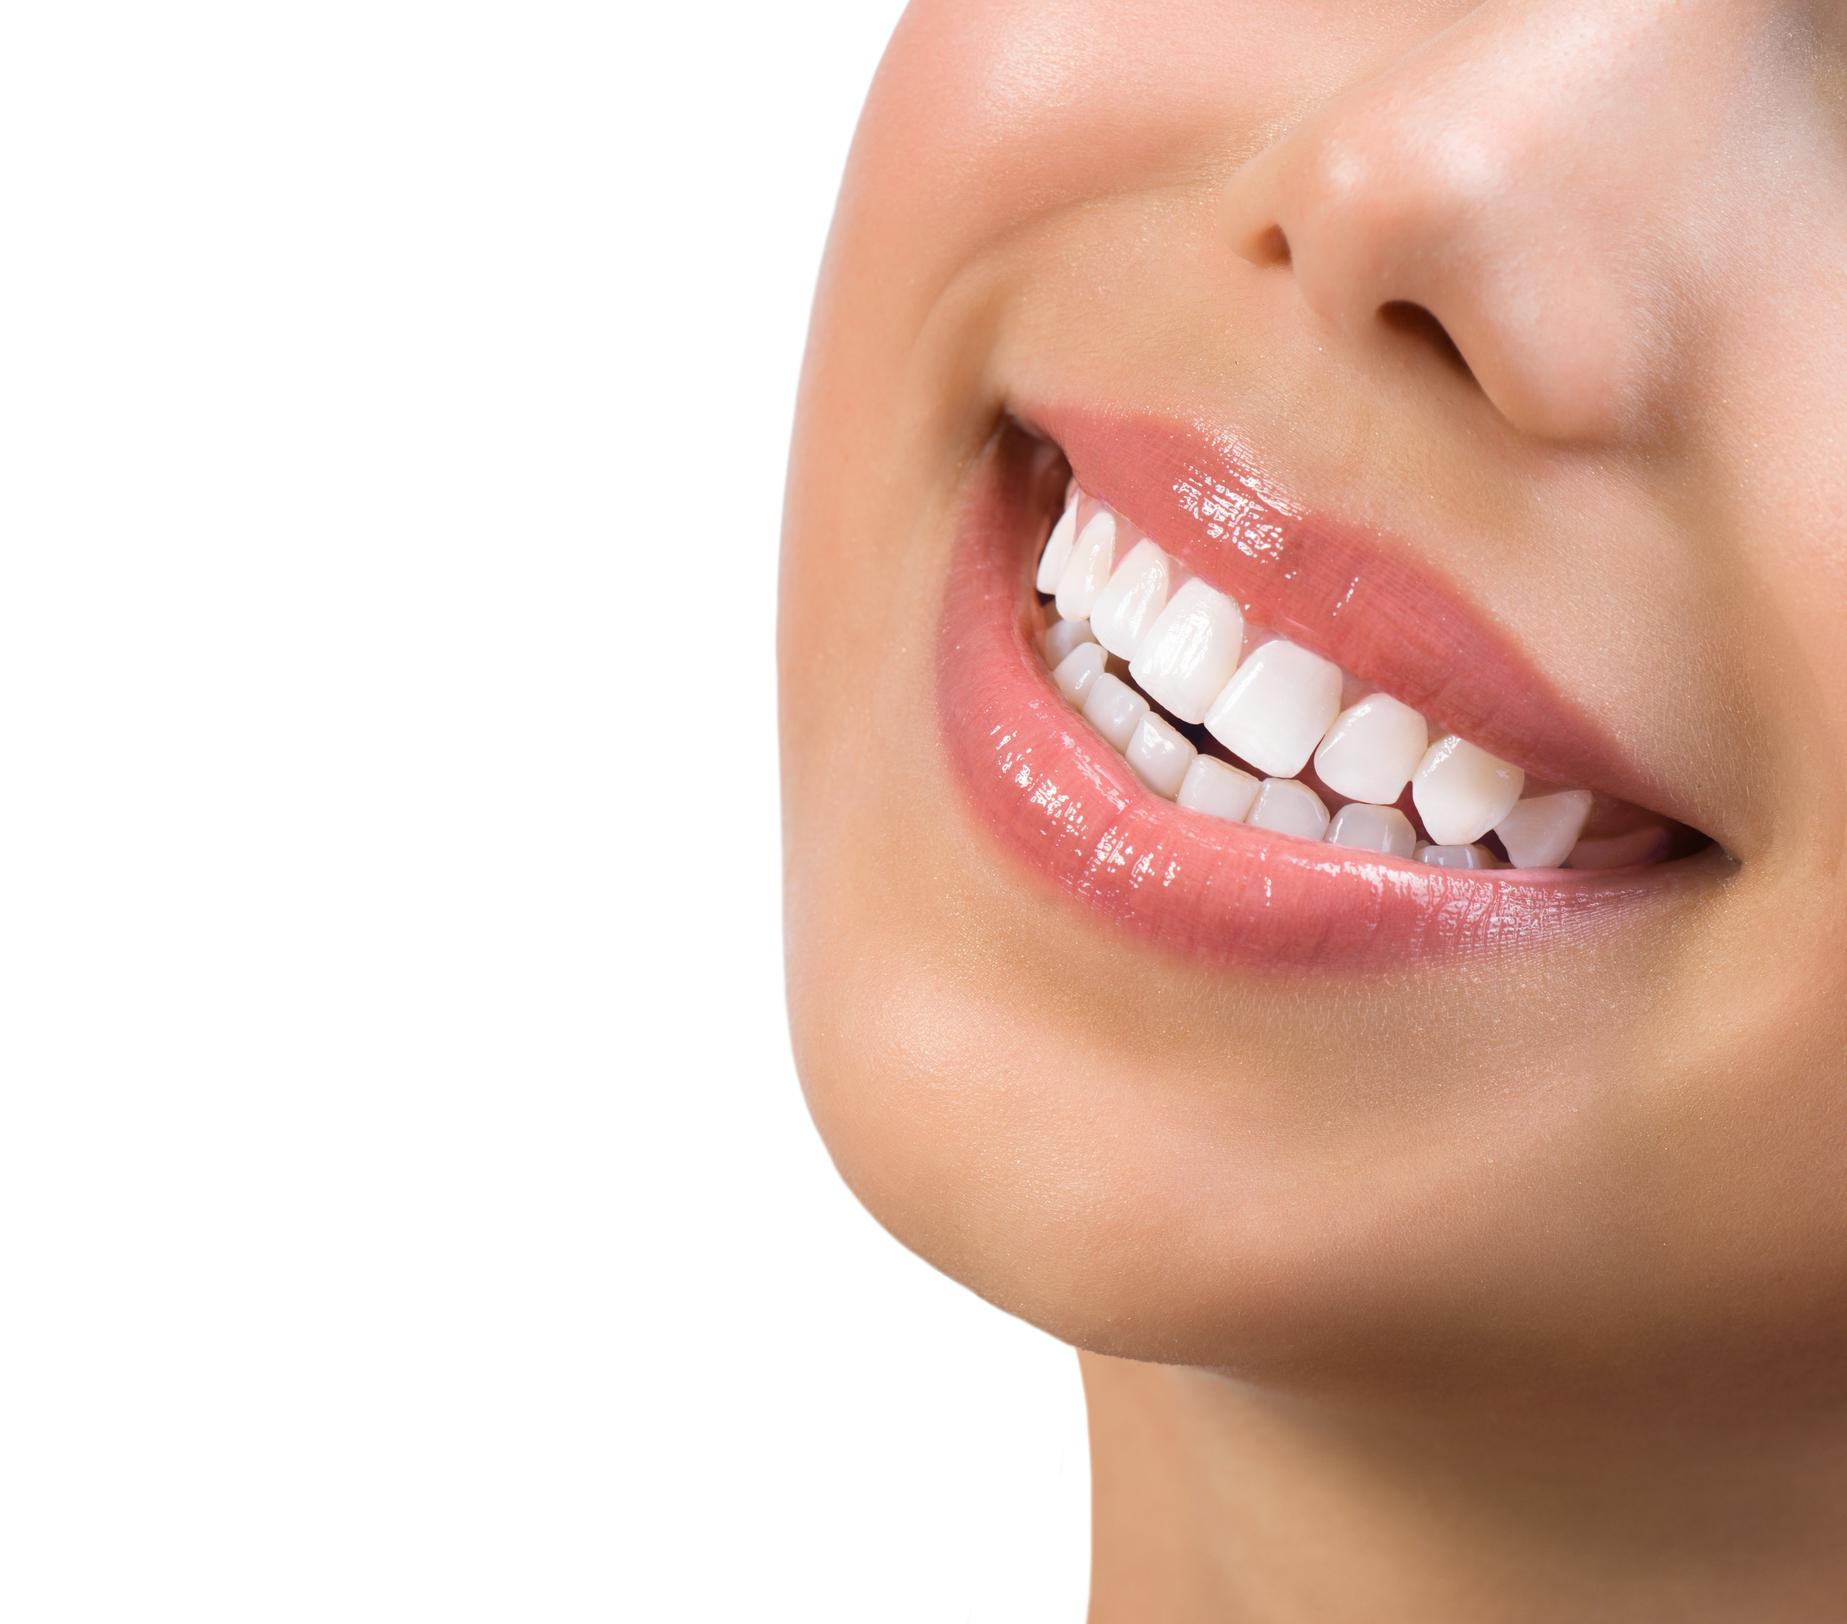 Month Counter For Baby Pictures Repairing Broken Teeth